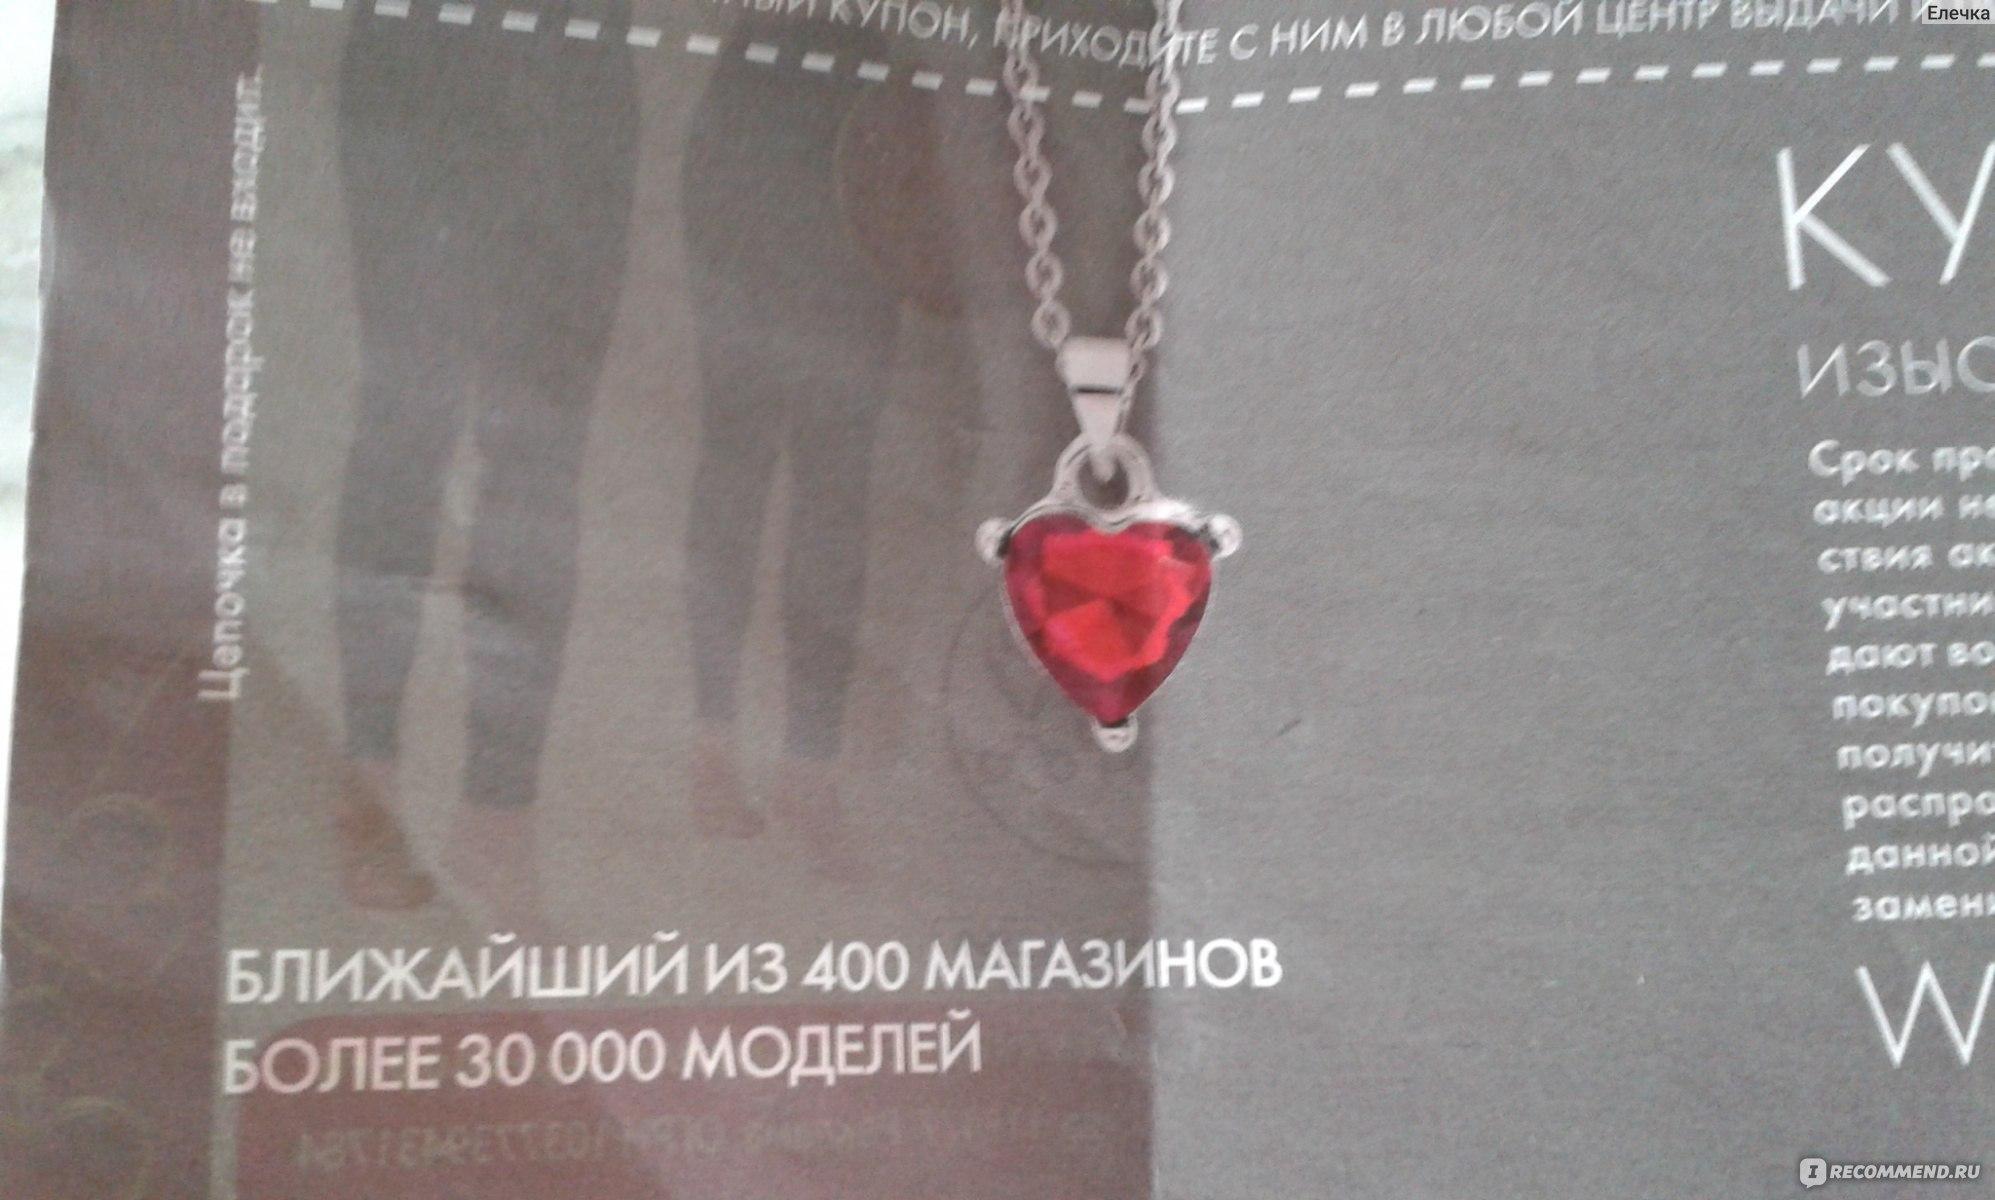 Подарок от магазина SUNLIGHT 37